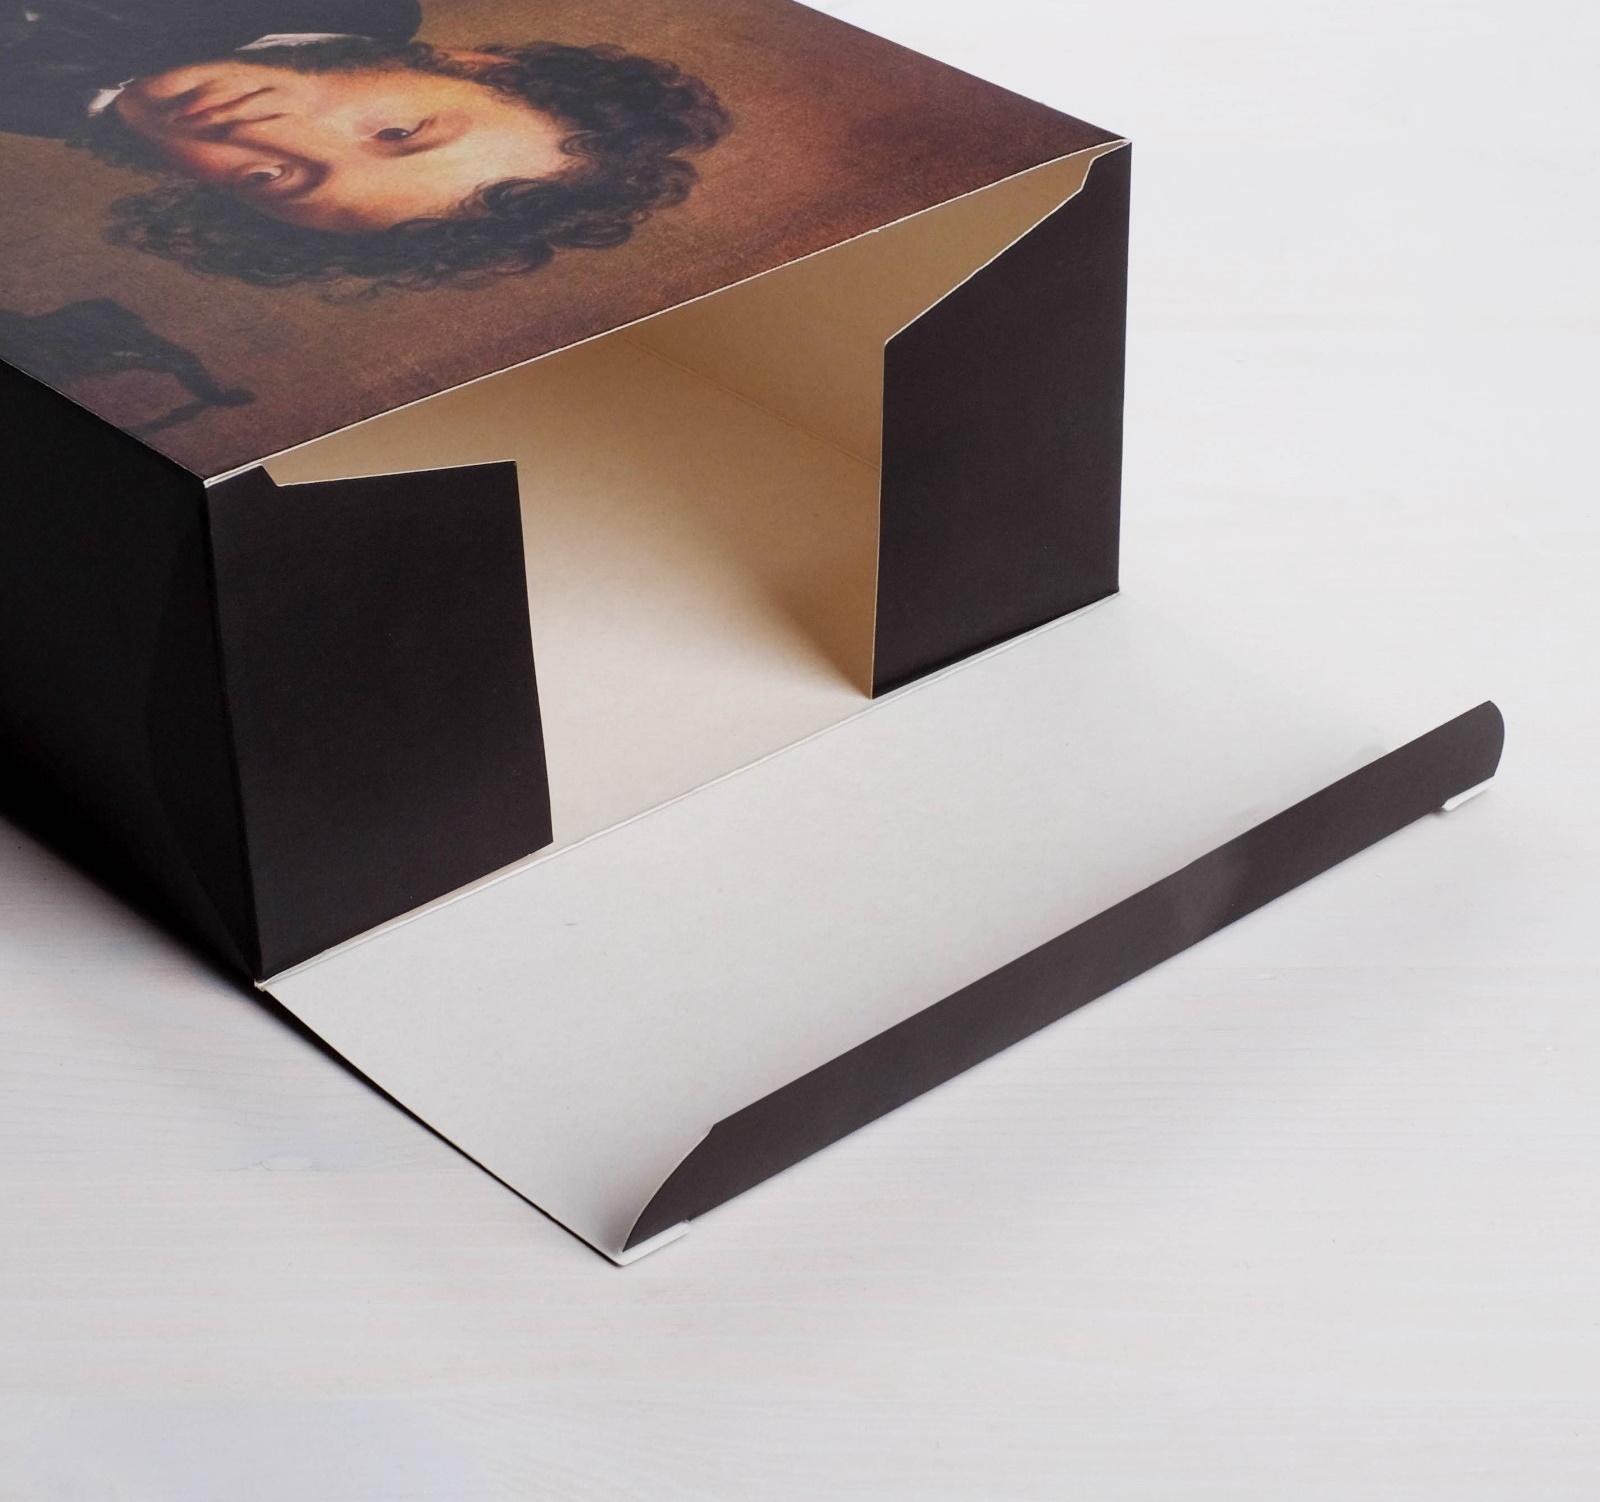 Коробка складная «Пушкин», 16  23  7.5 см